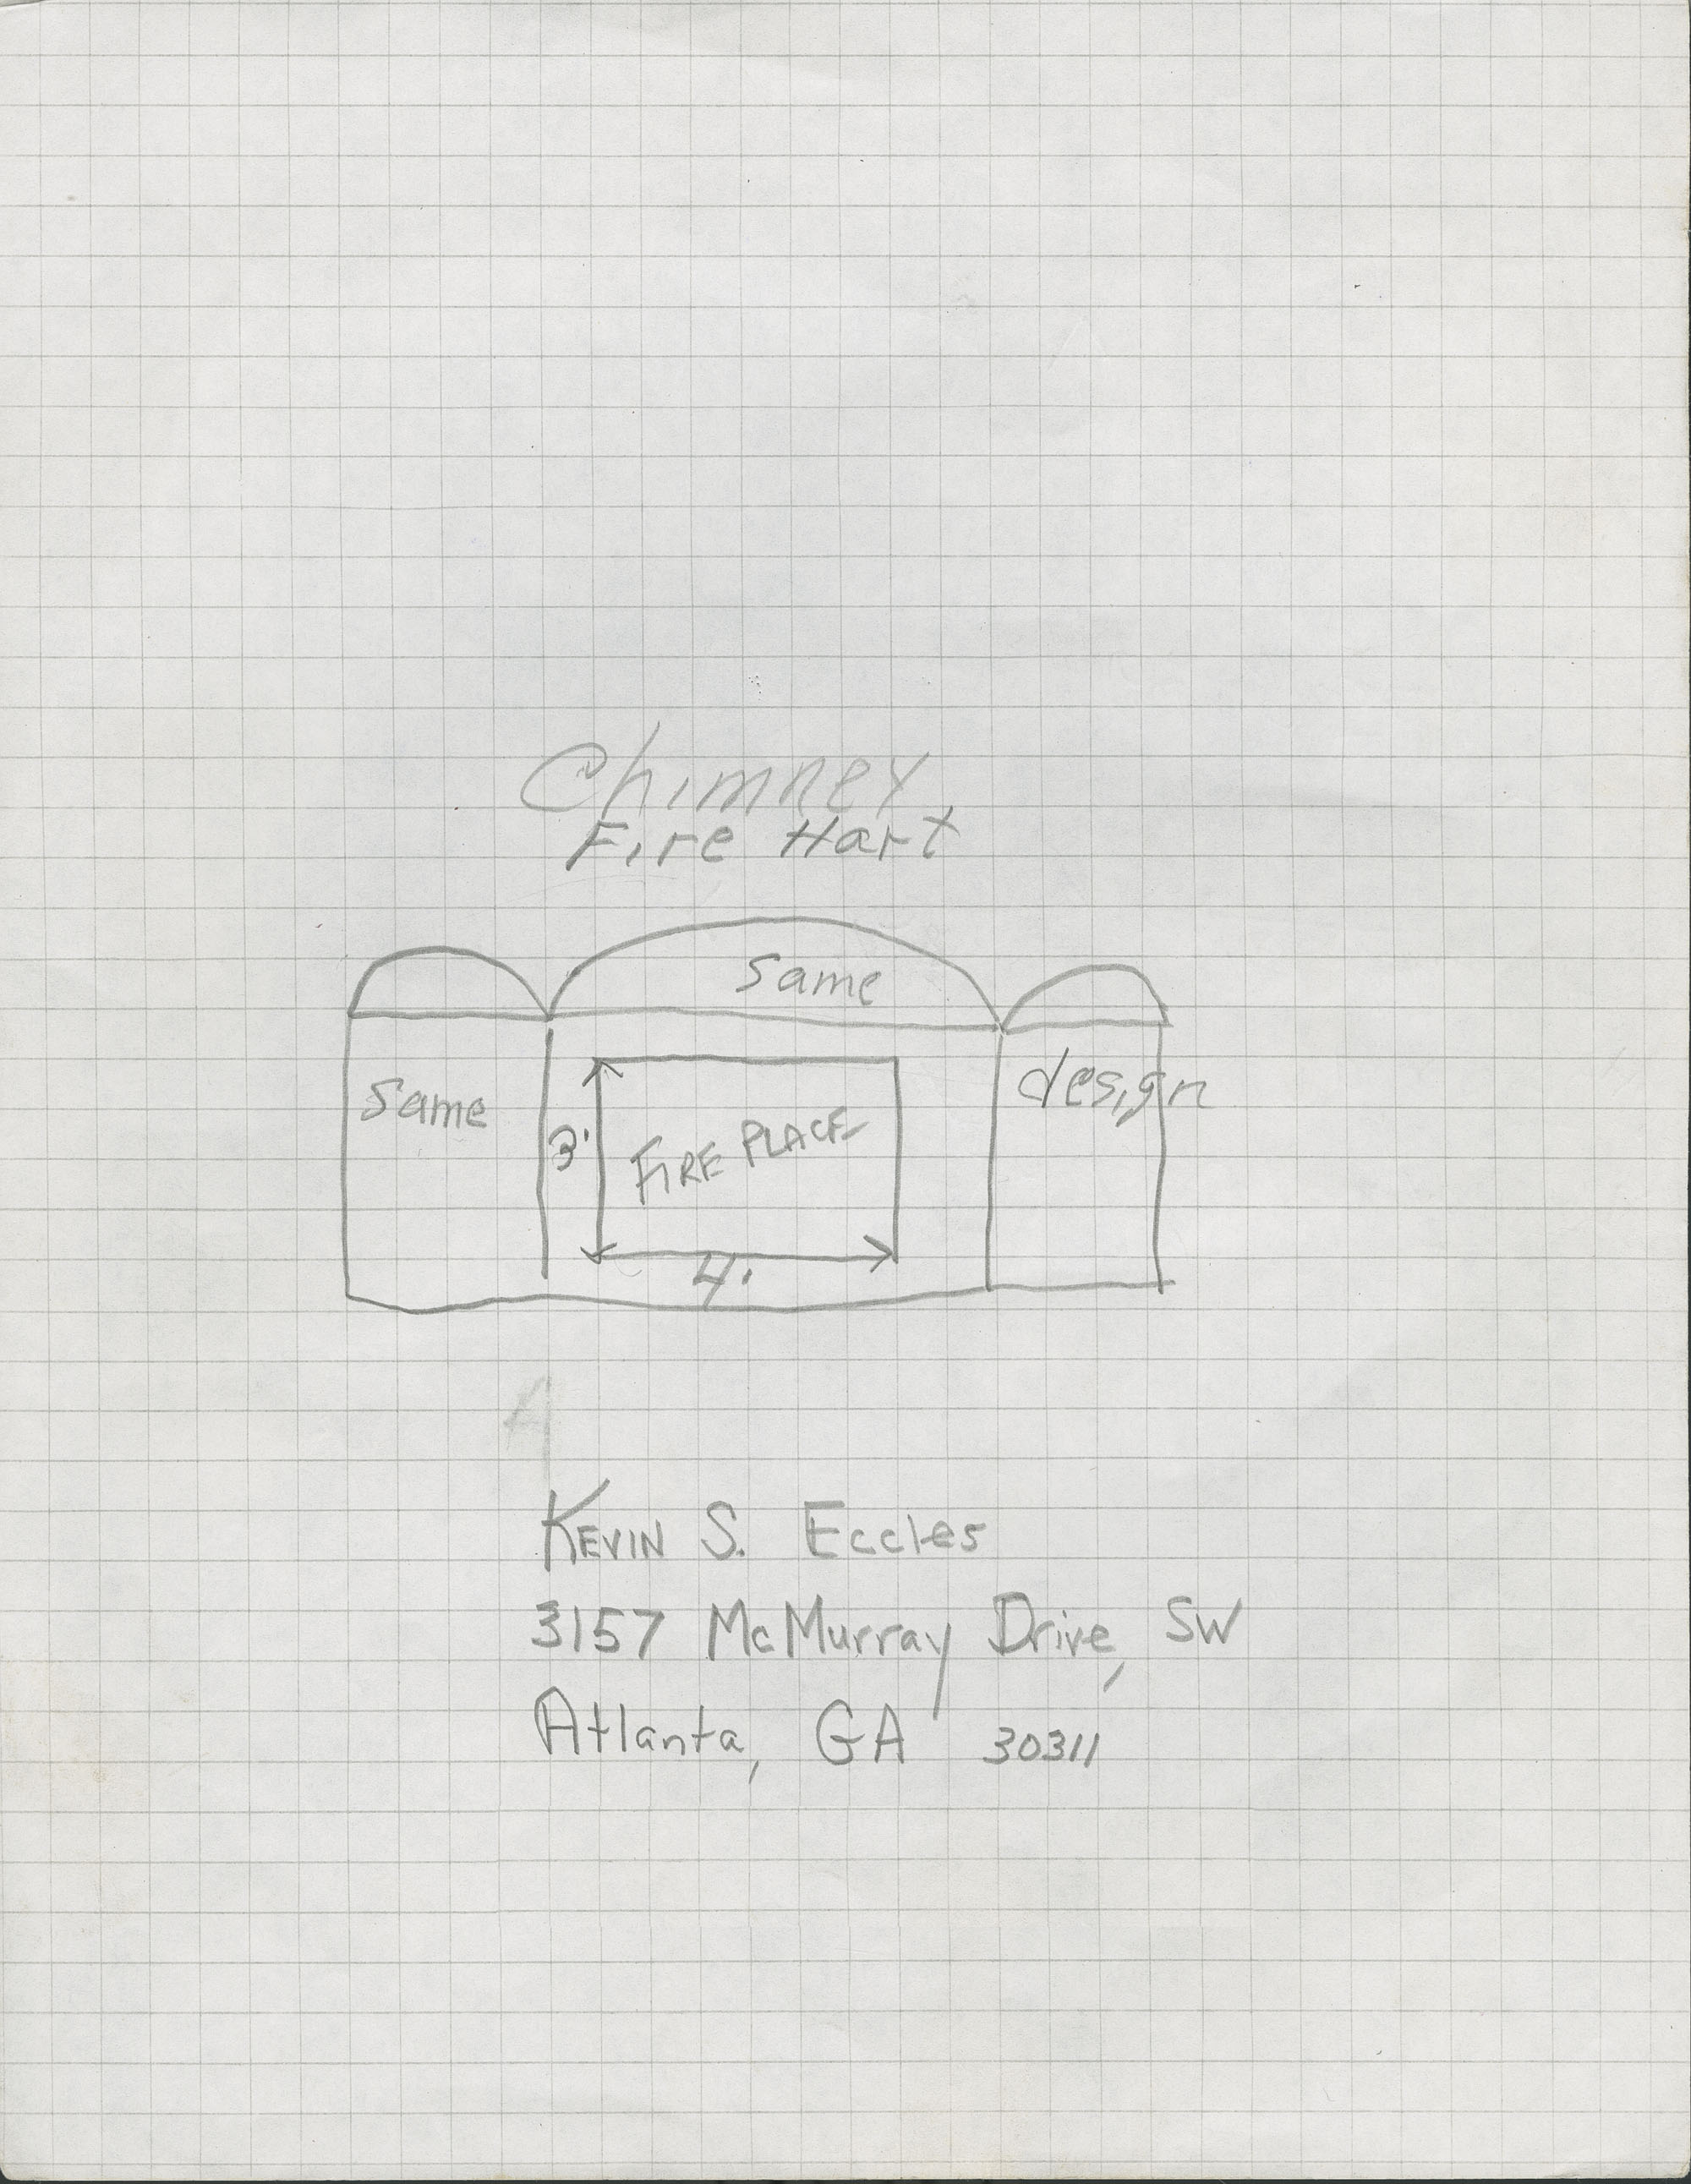 3157 McMurray Drive, SW, Atlanta, Georgia fireplace gate